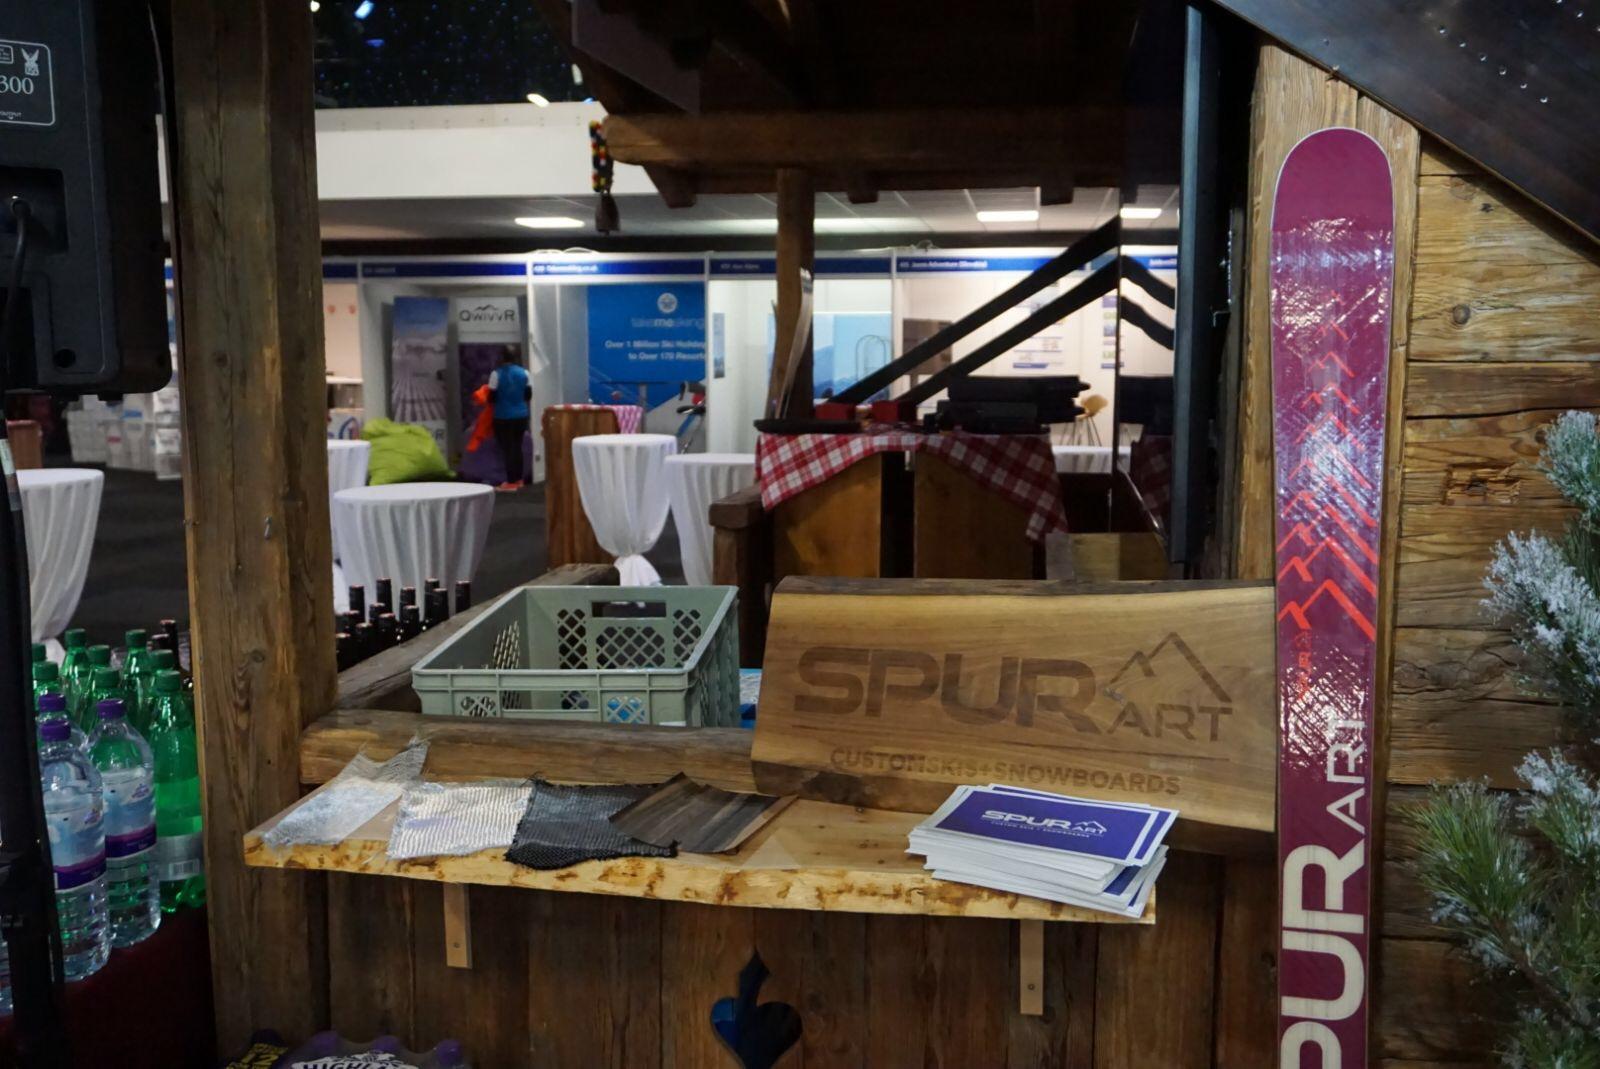 Der SPURart Messestand bei der Hütte der Tirol Werbung.